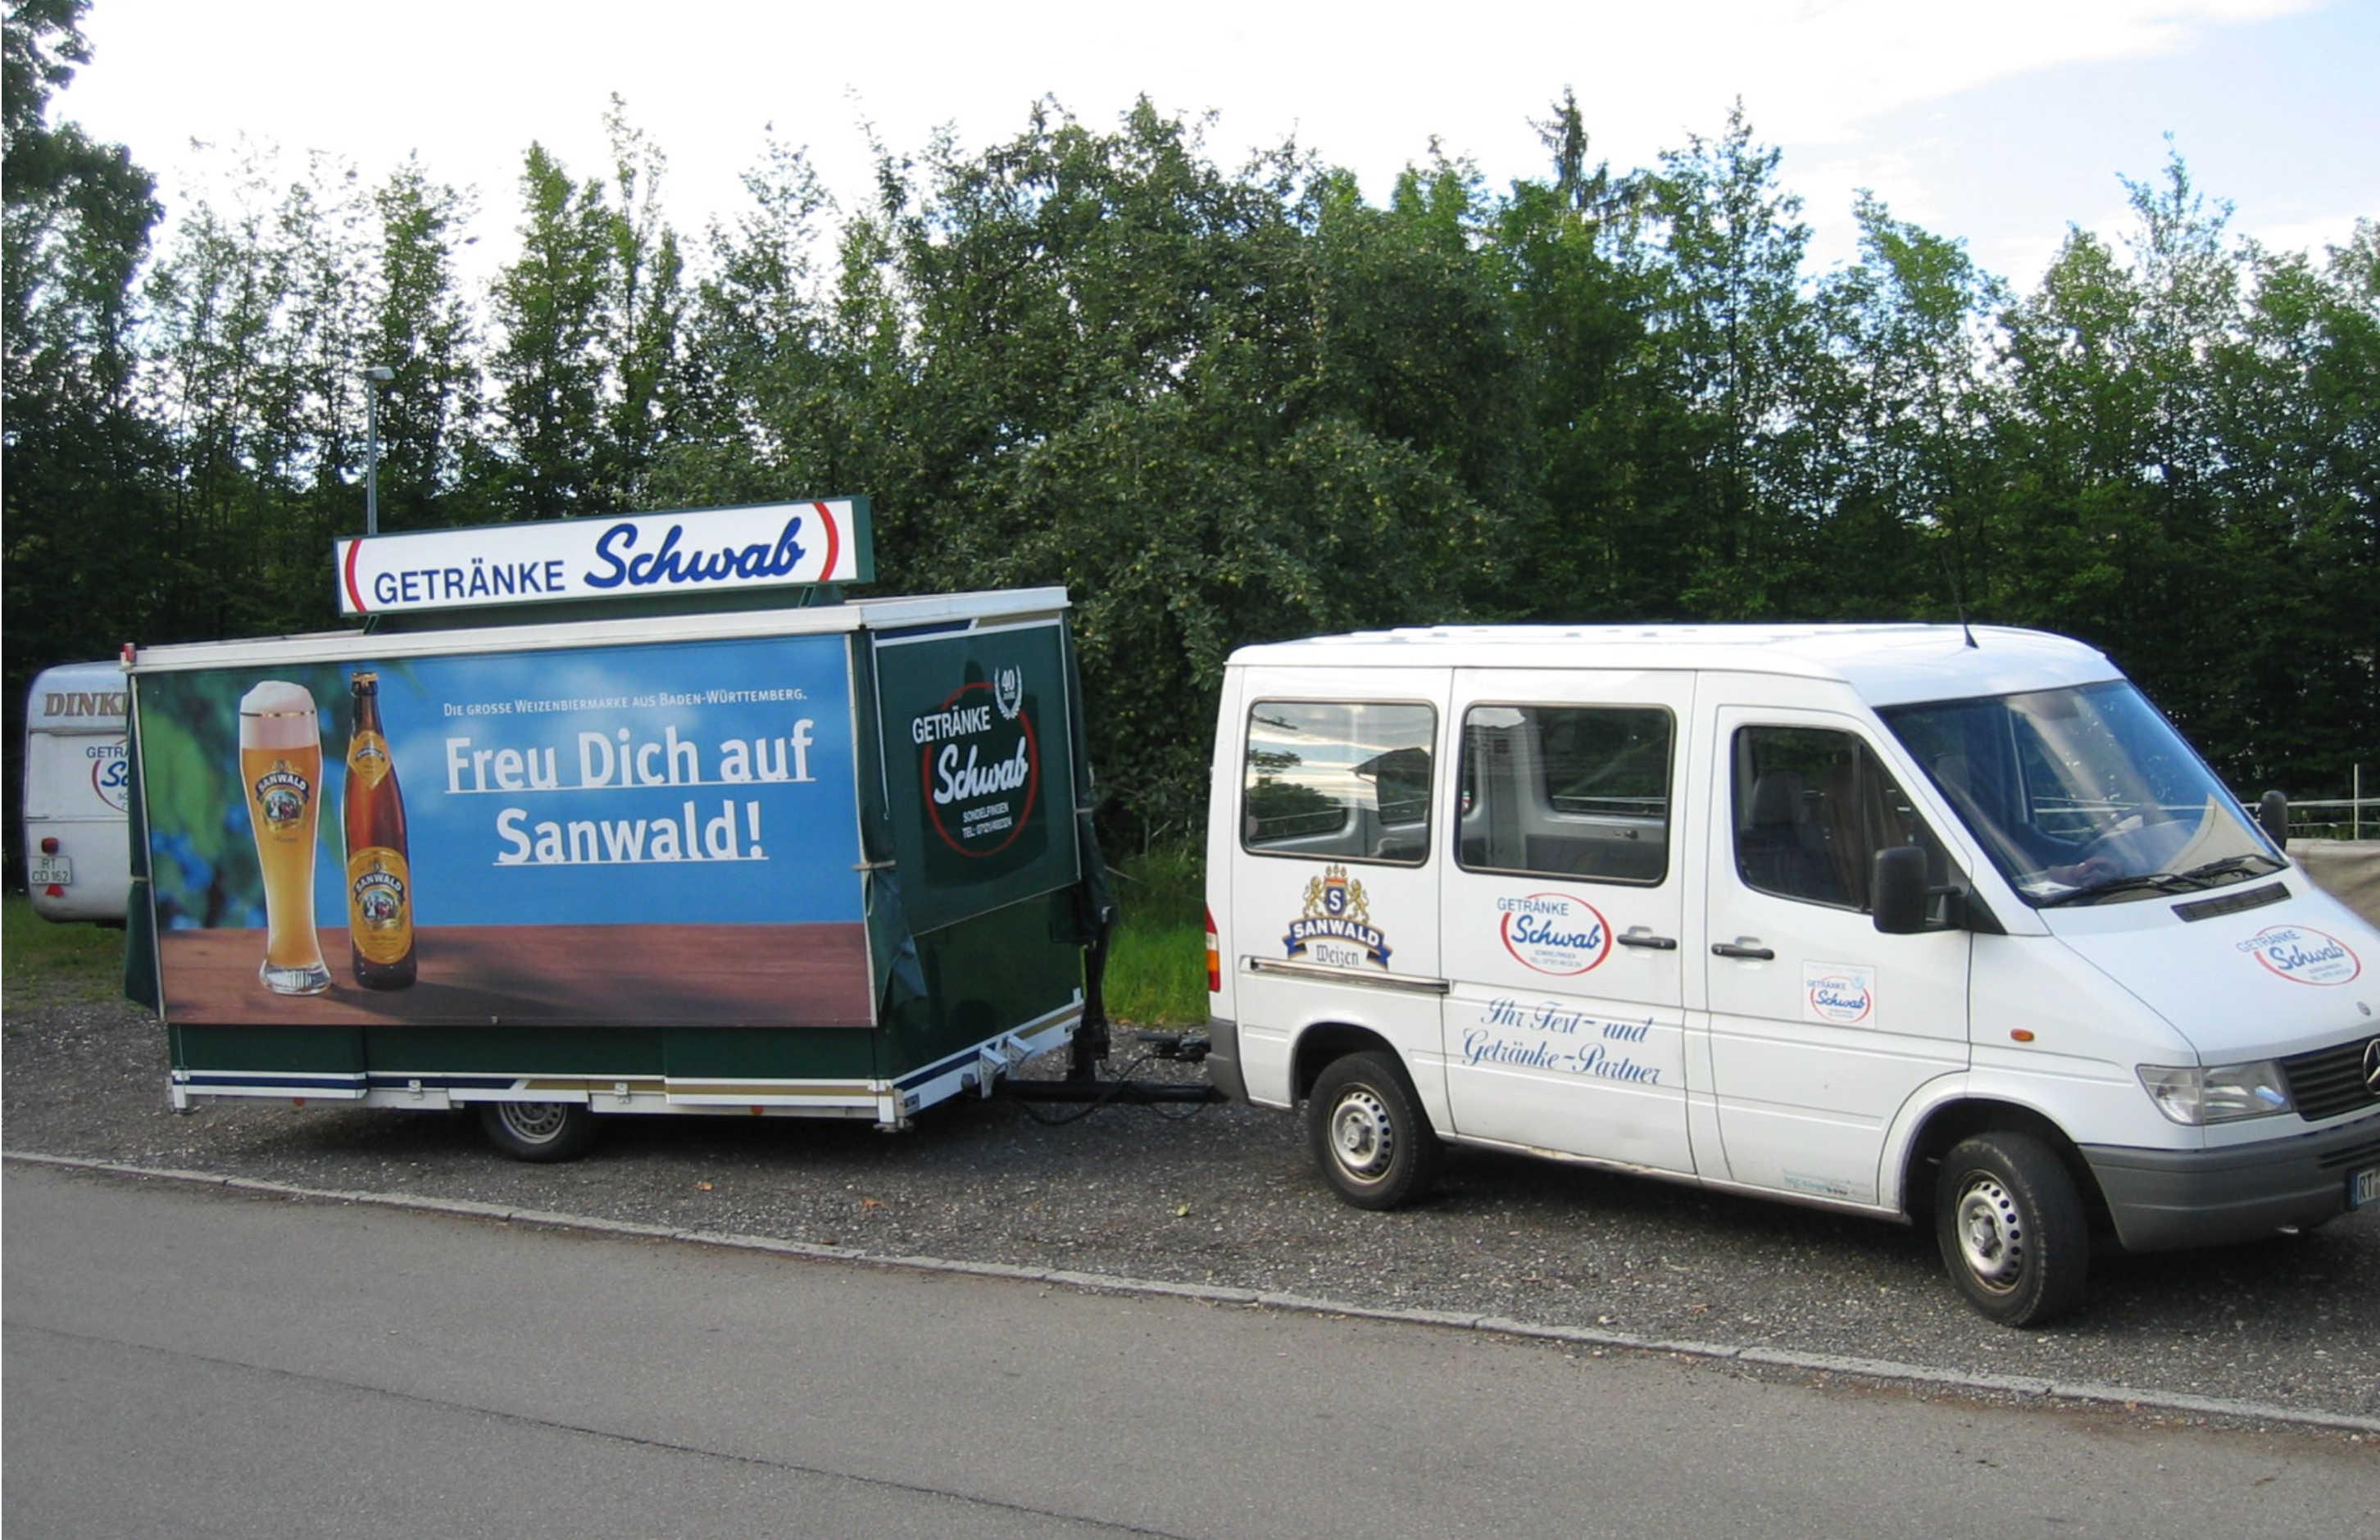 Erfrischungsgetränke | Getränke Schwab | Reutlingen, Tübingen, Esslingen